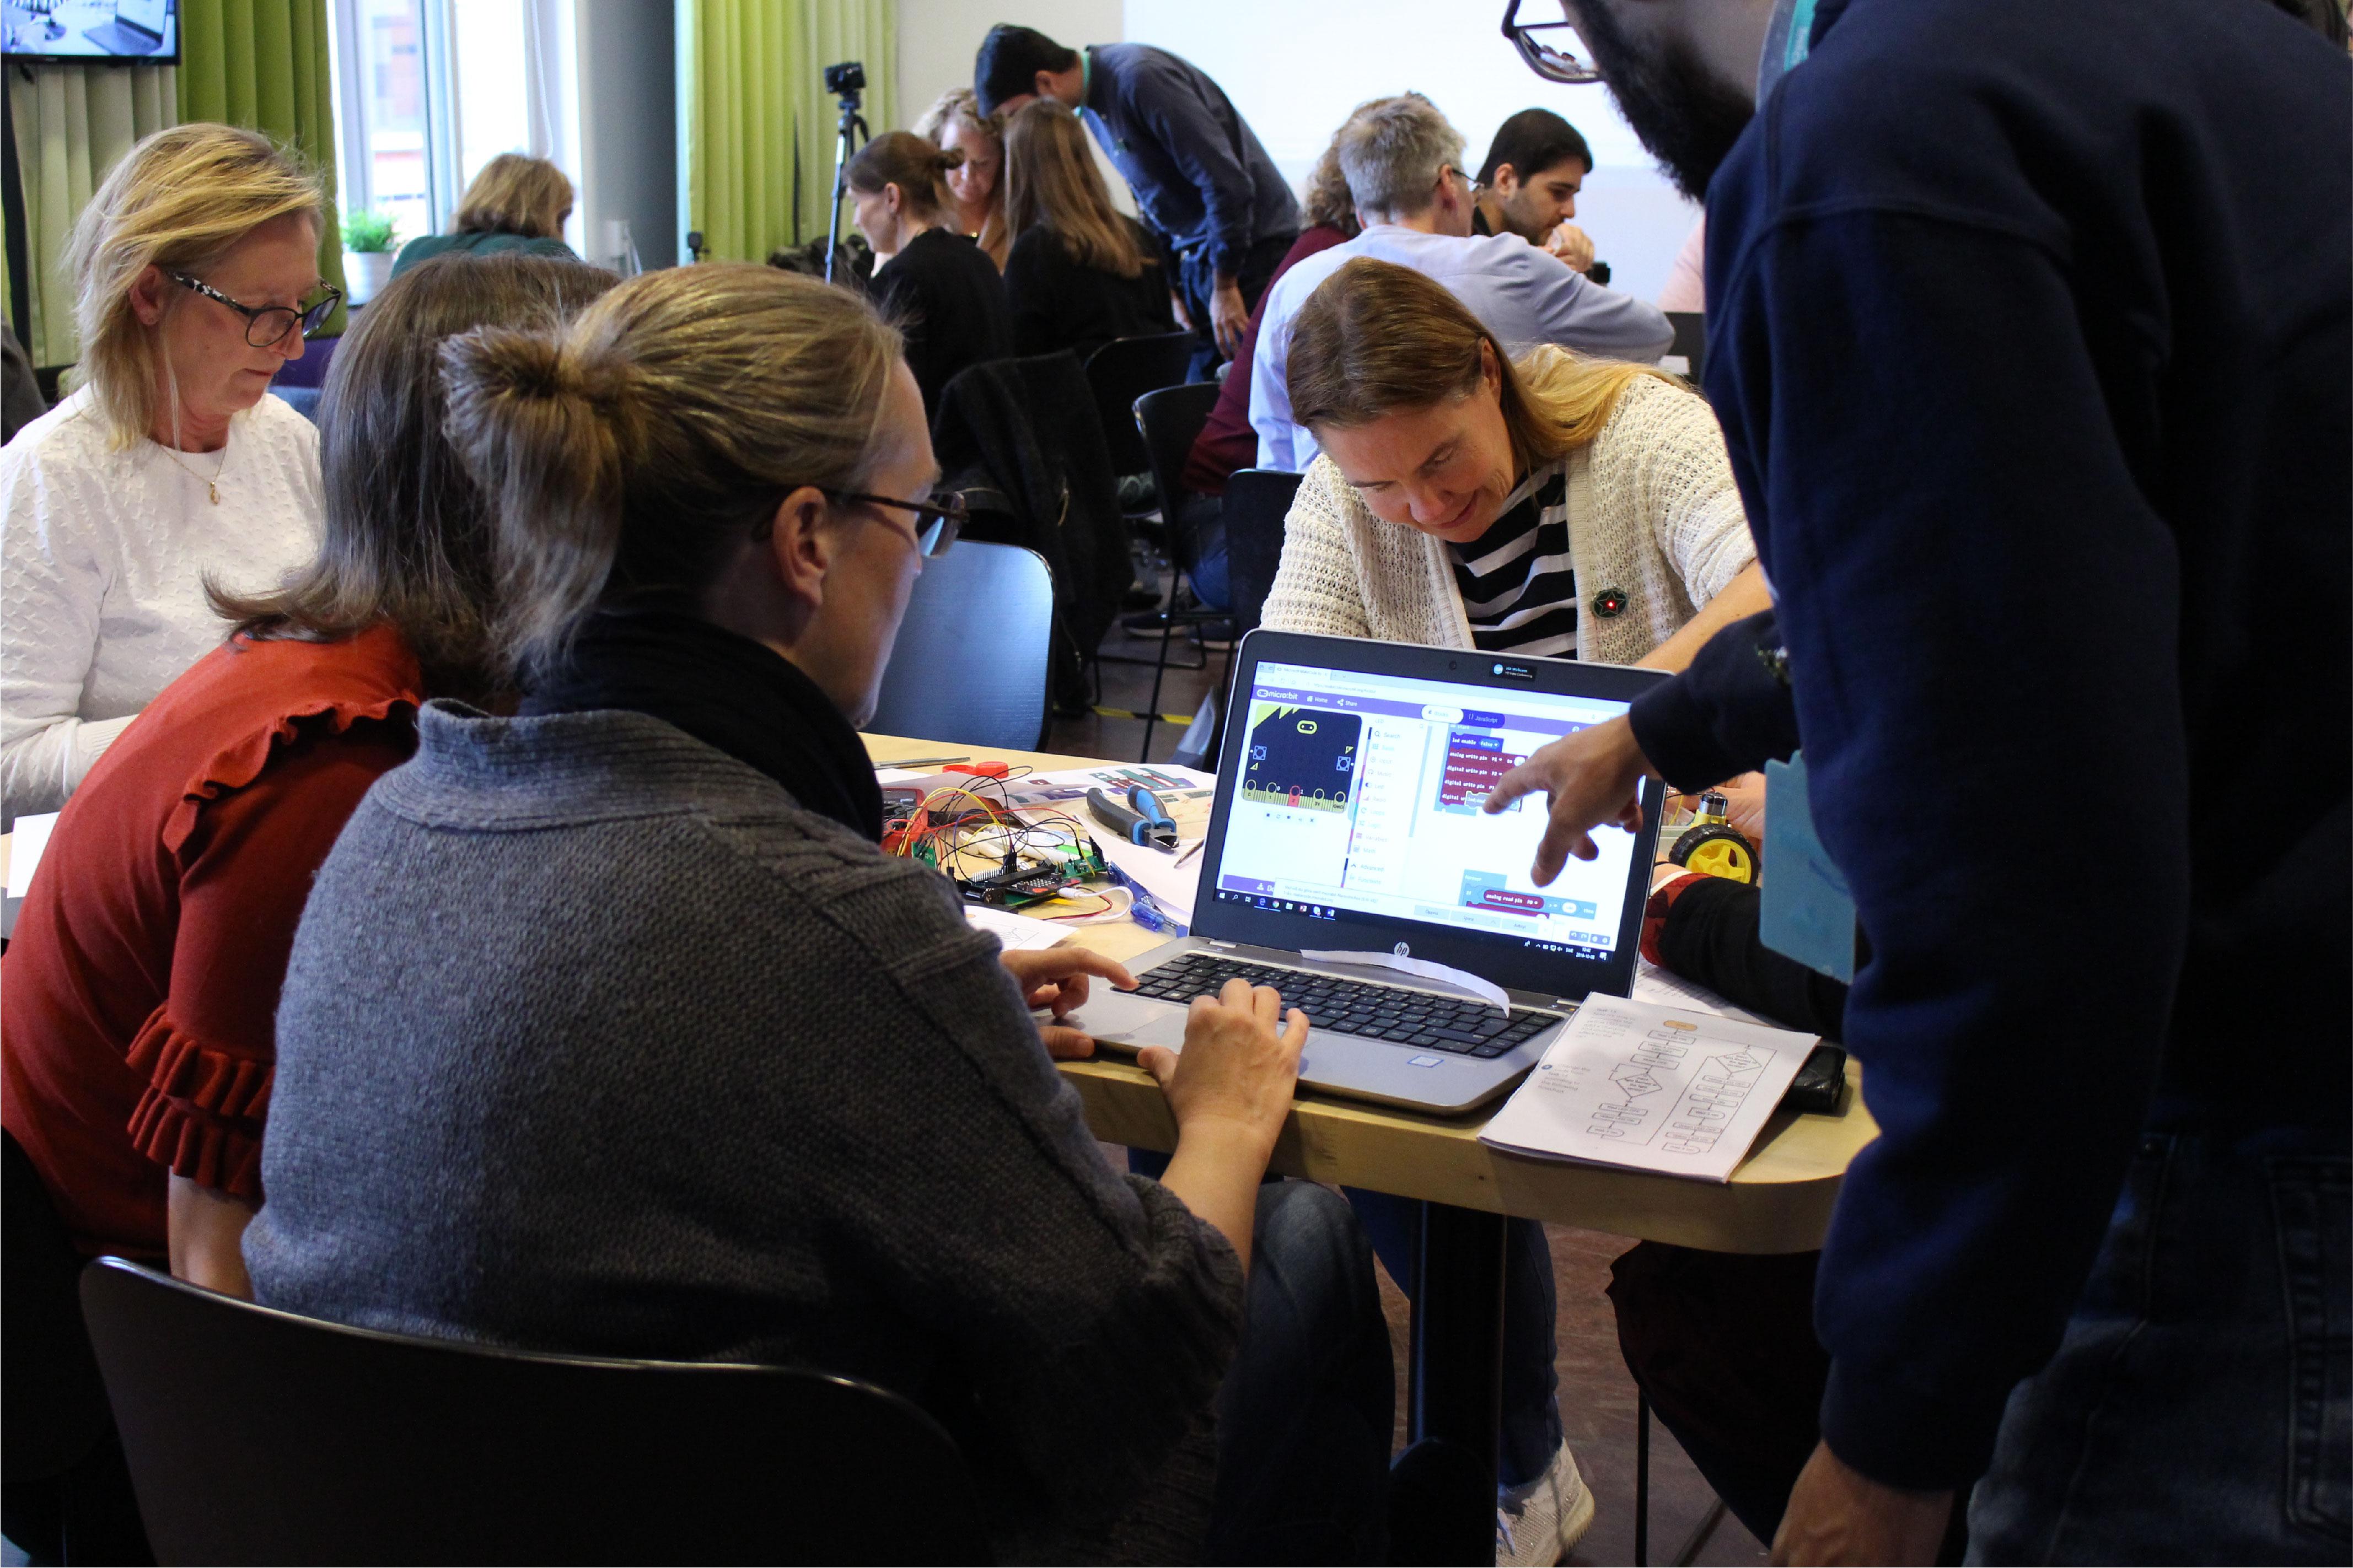 Several teachers participating at a teacher training workshop